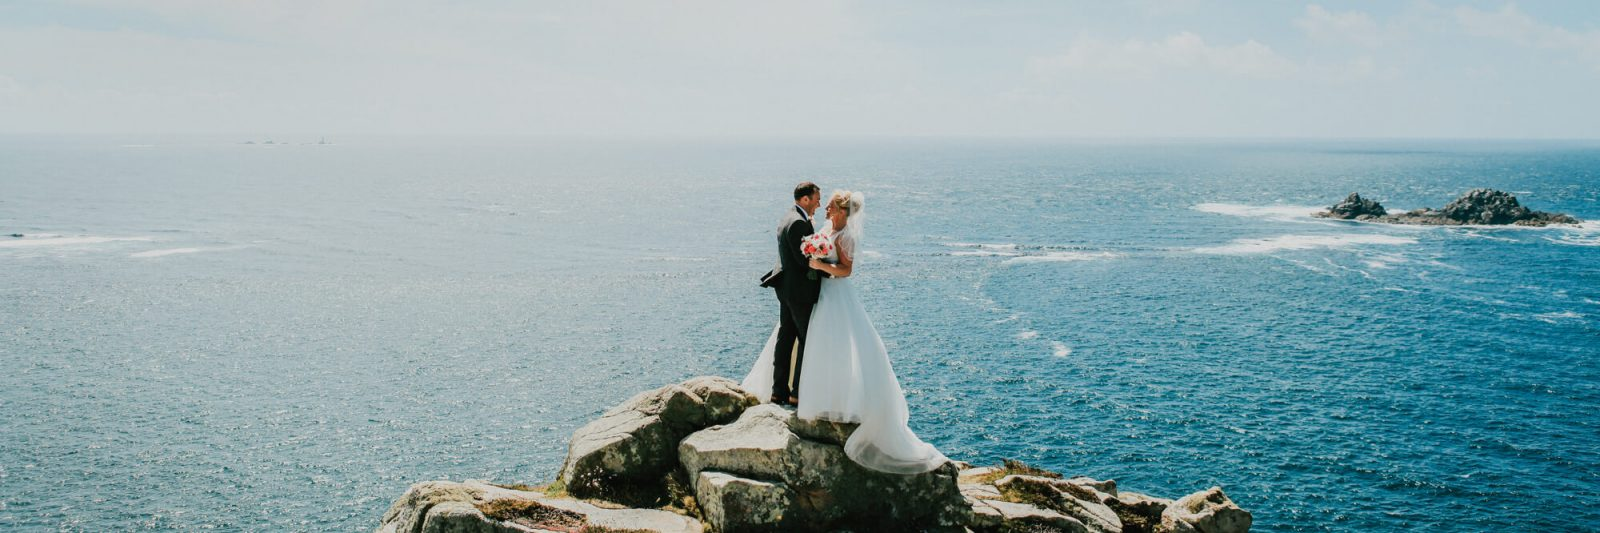 Cape Cornwall Wedding Photographers 1600x533 - Photography Style